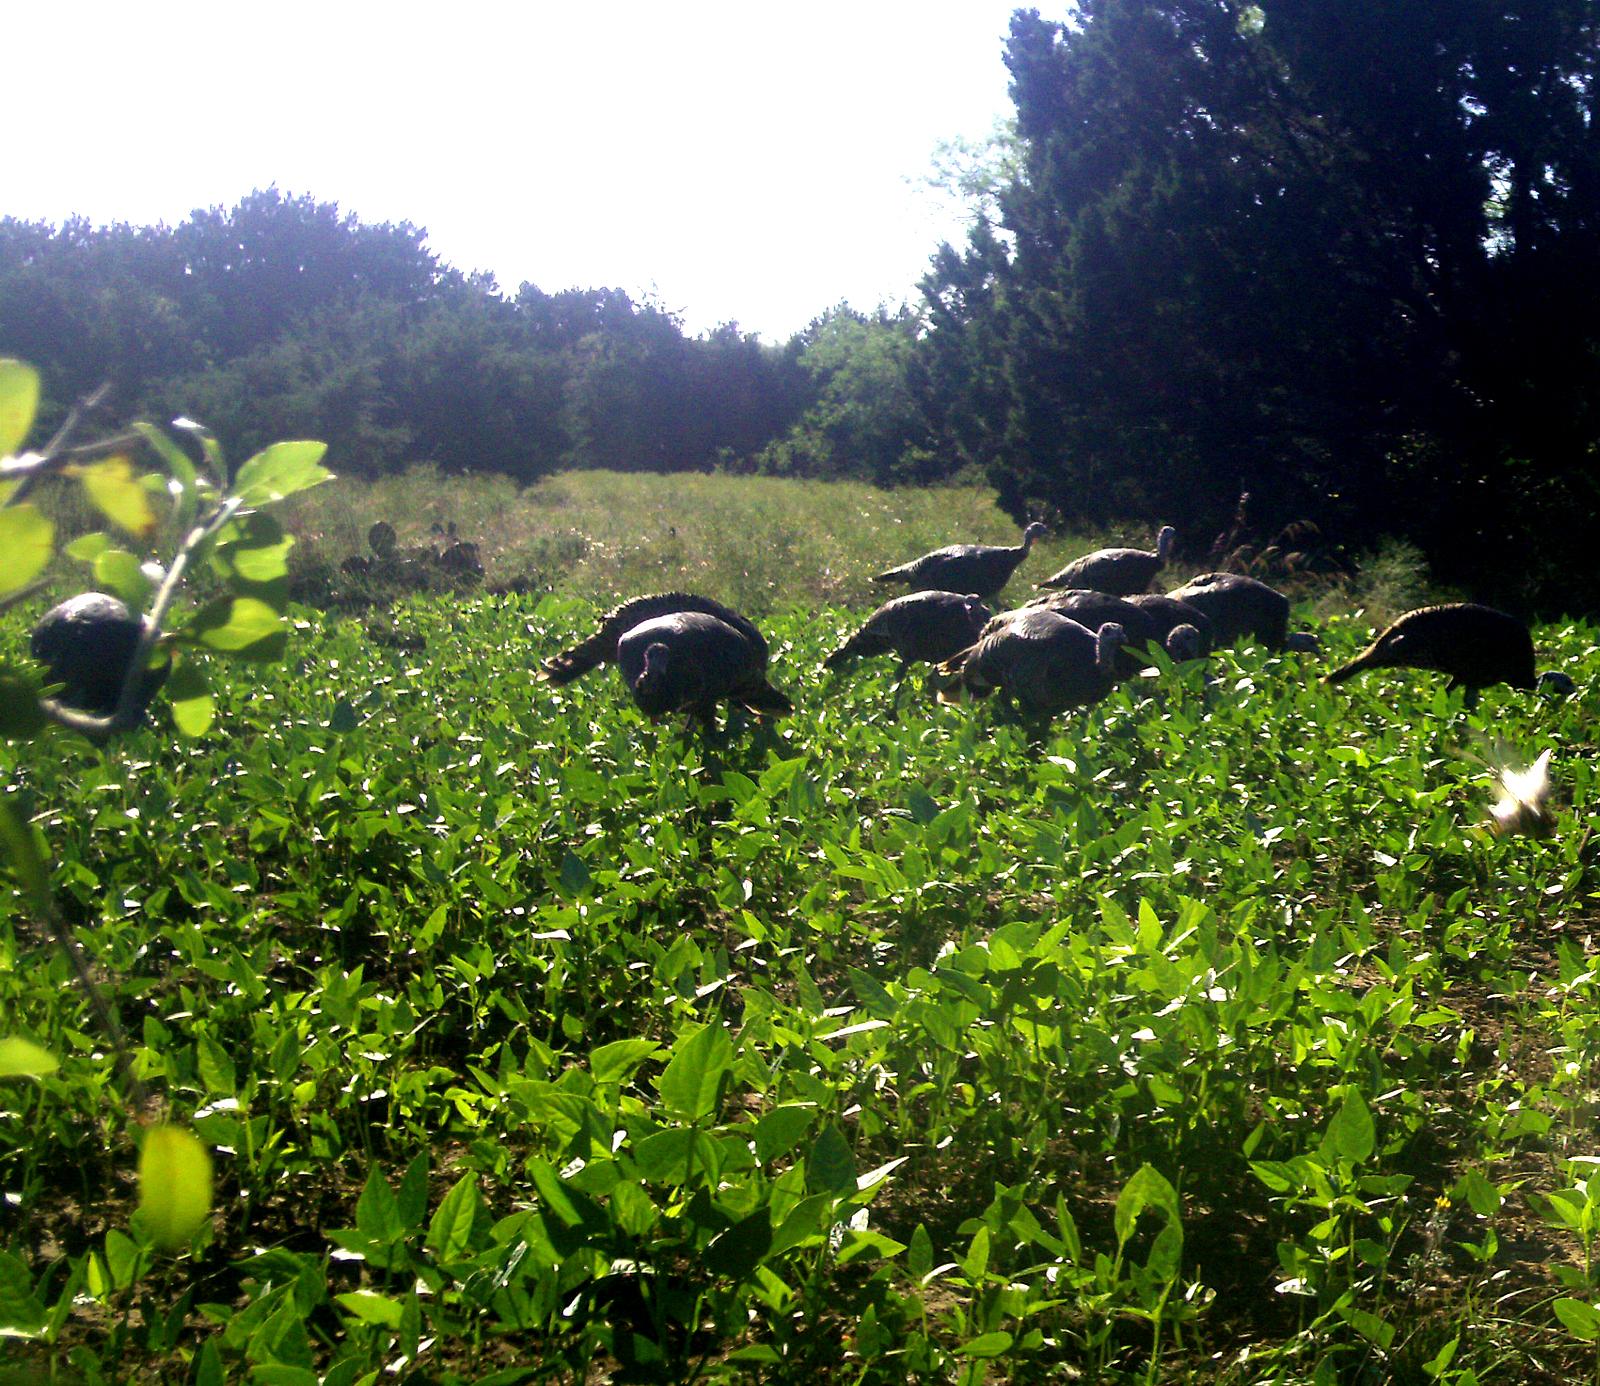 Wild Turkey Hens in a lush food plot.